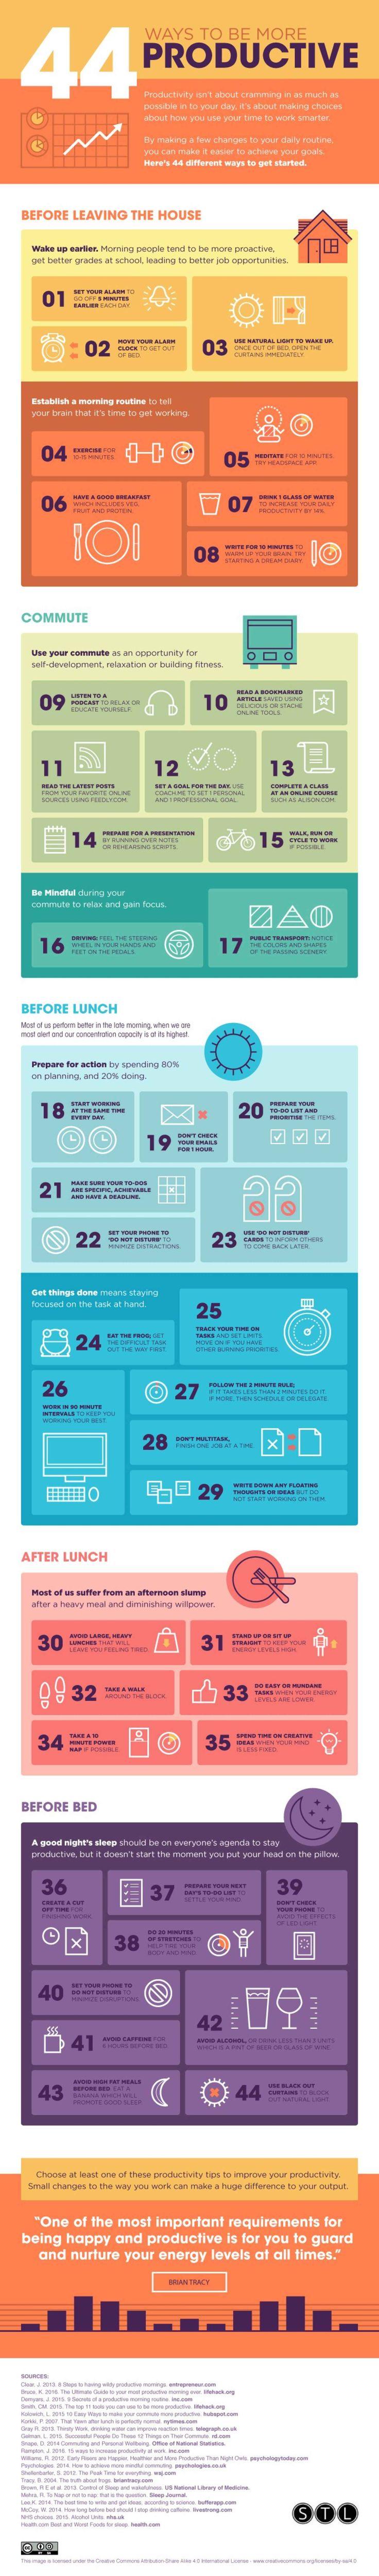 Read 44 Ways To Be More Productive - Do you fancy an infographic? There are a lot of them online, but if you want your own please visithttp://www.linfografico.com/prezzi/ Online girano molte infografiche, se ne vuoi realizzare una tutta tua visitahttp://www.linfografico.com/prezzi/